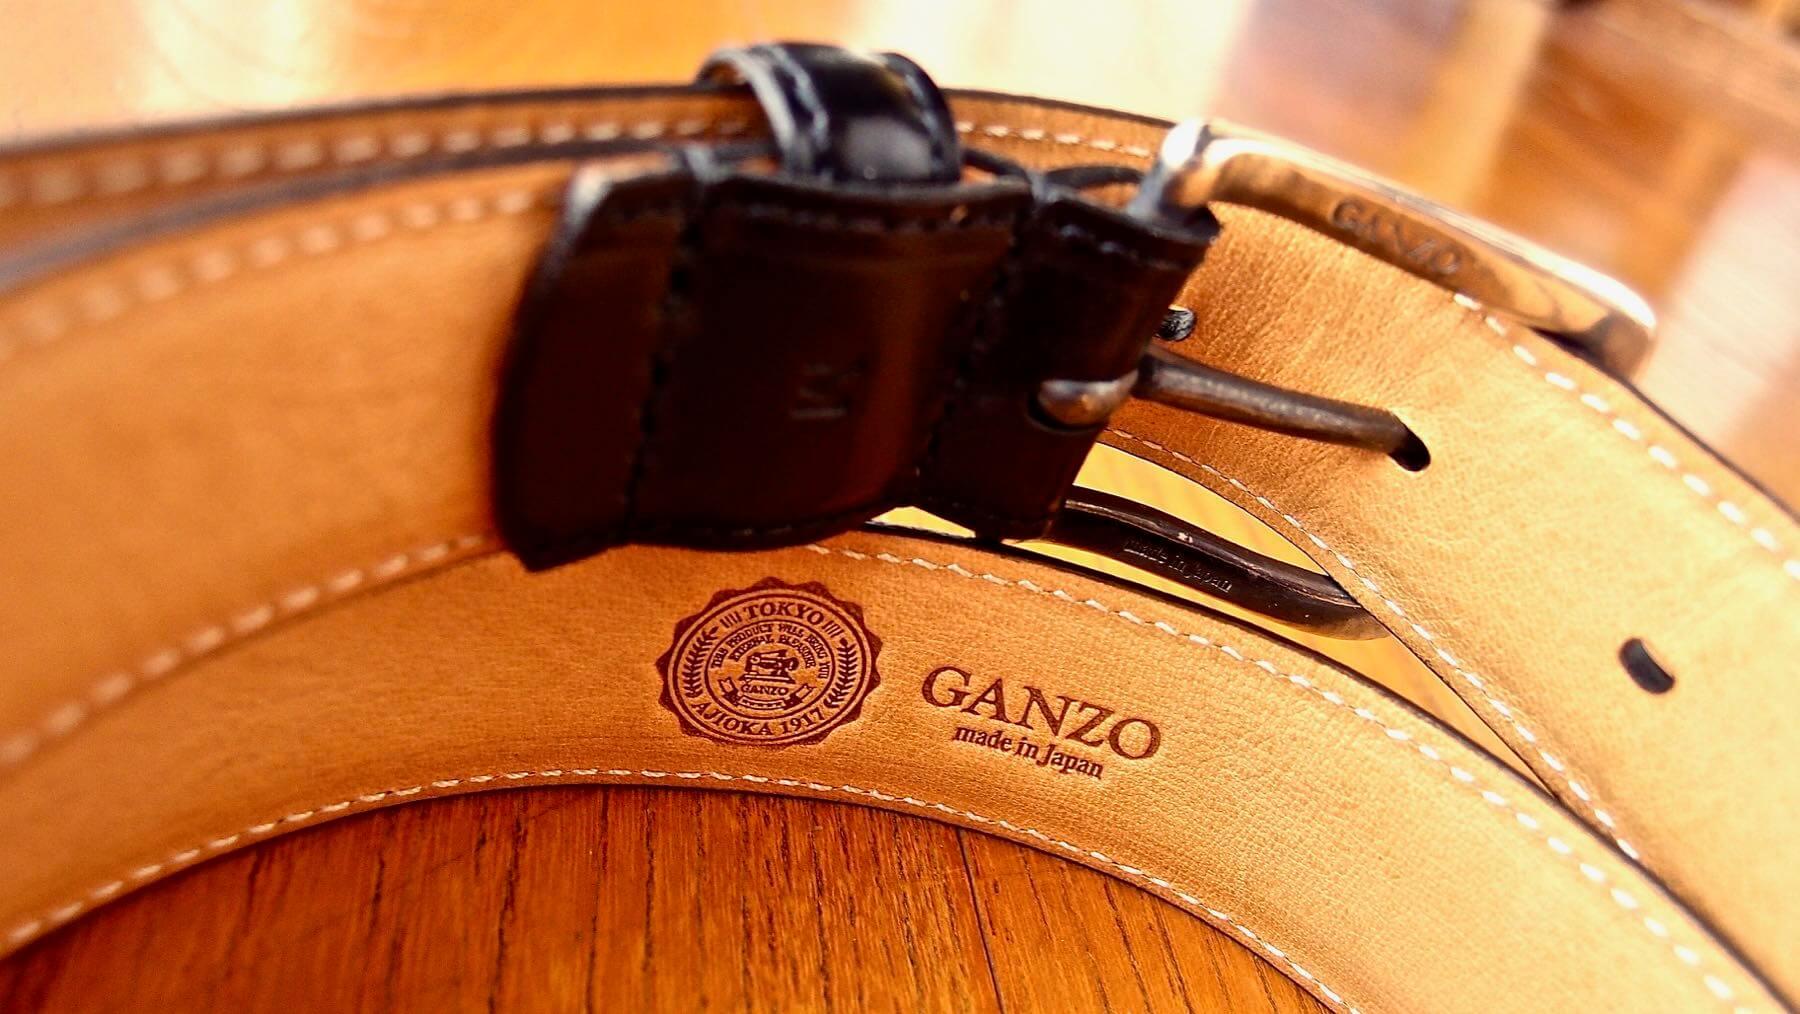 18 Ganzo leather belt BRIDLE